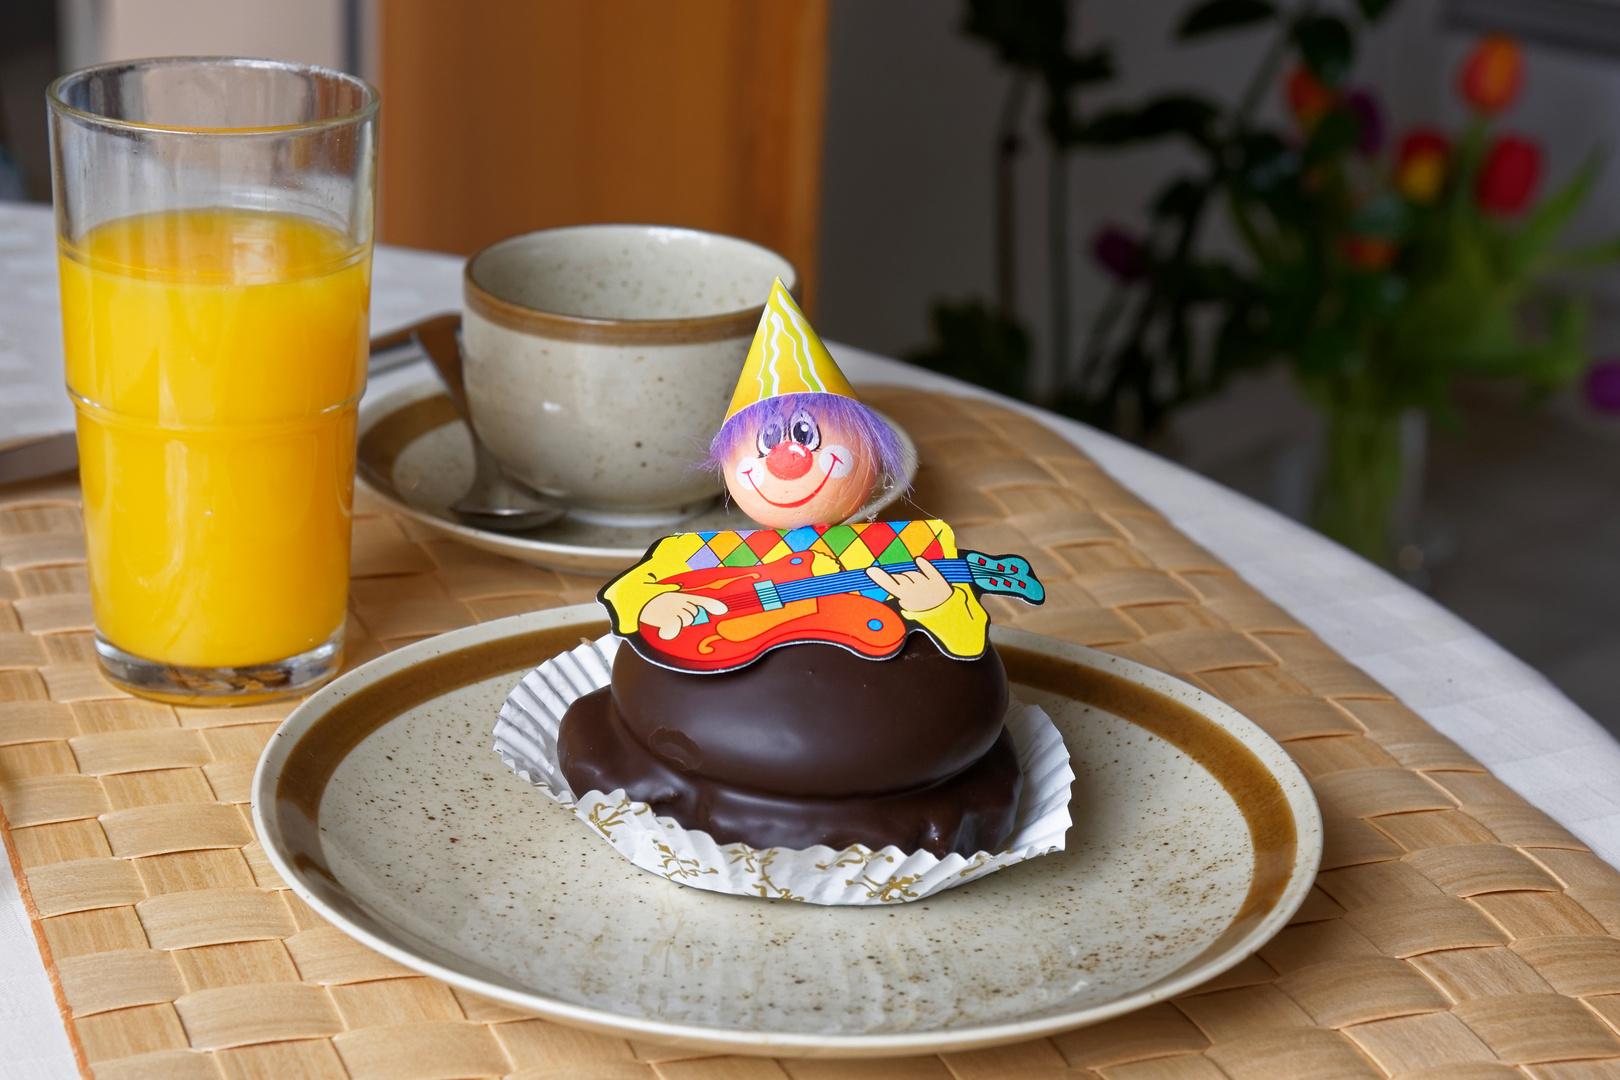 Karneval zum Frühstück